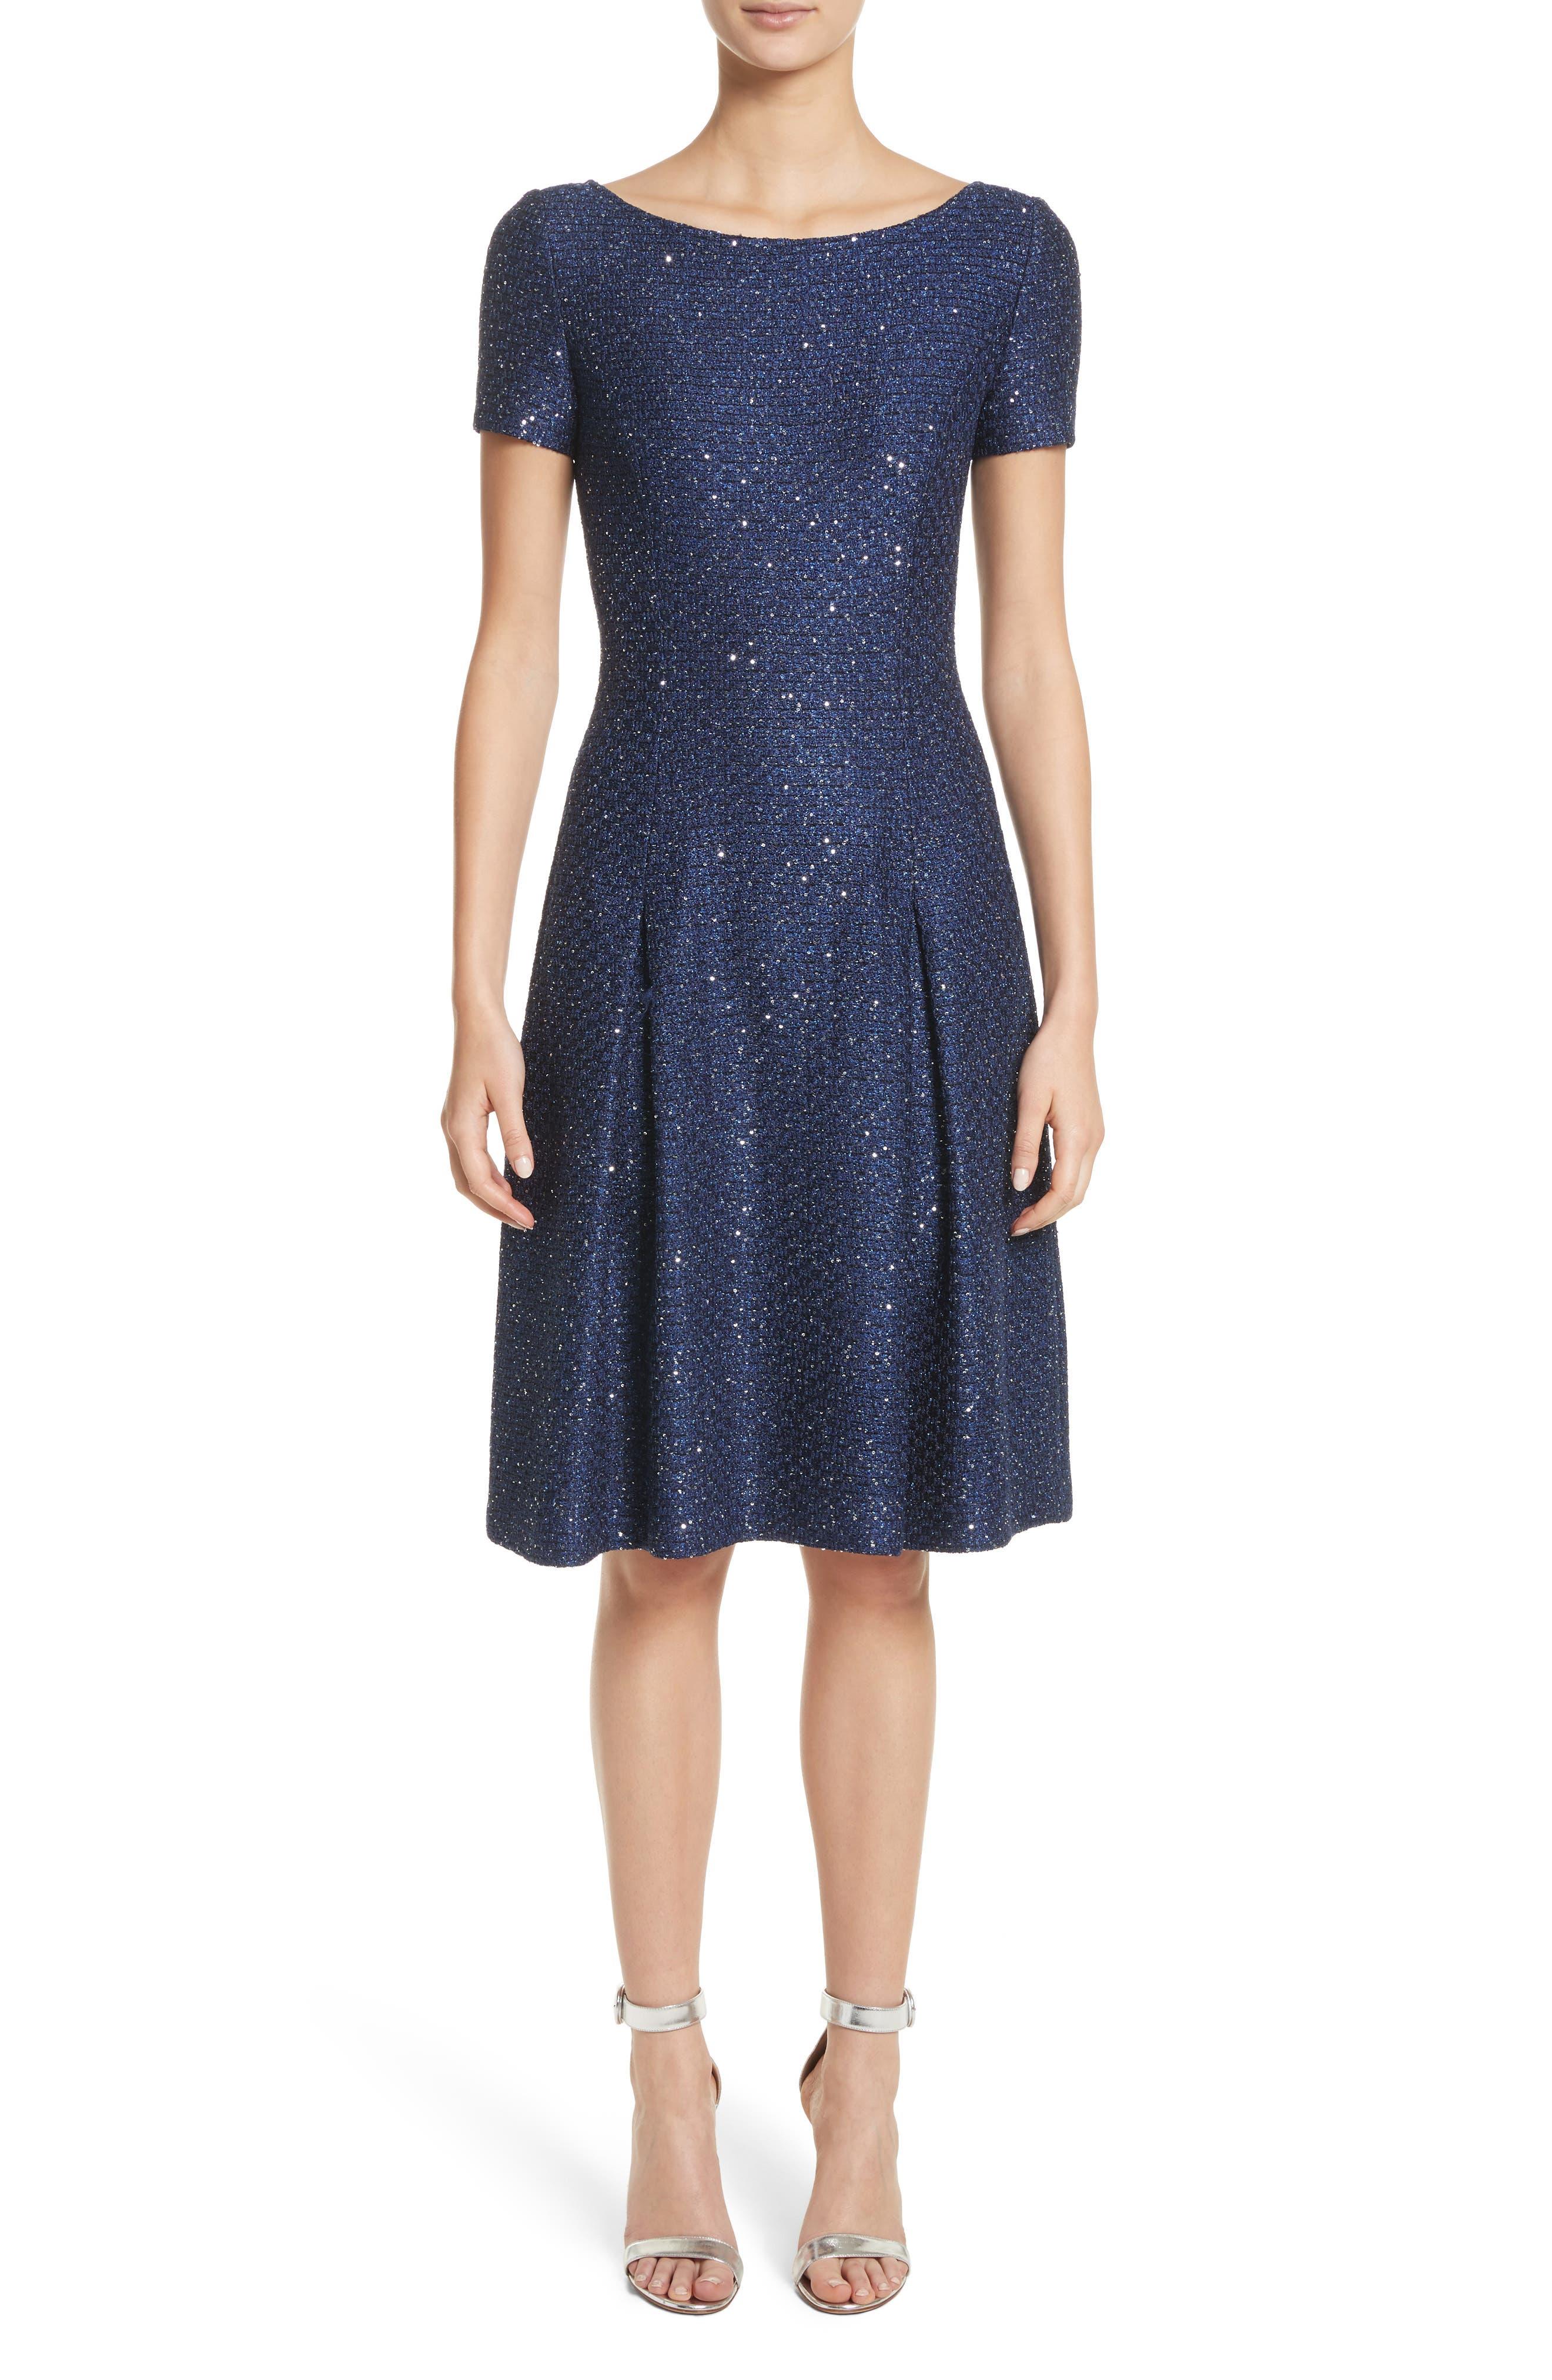 St. John Collection Sparkle Sequin Knit Fit & Flare Dress